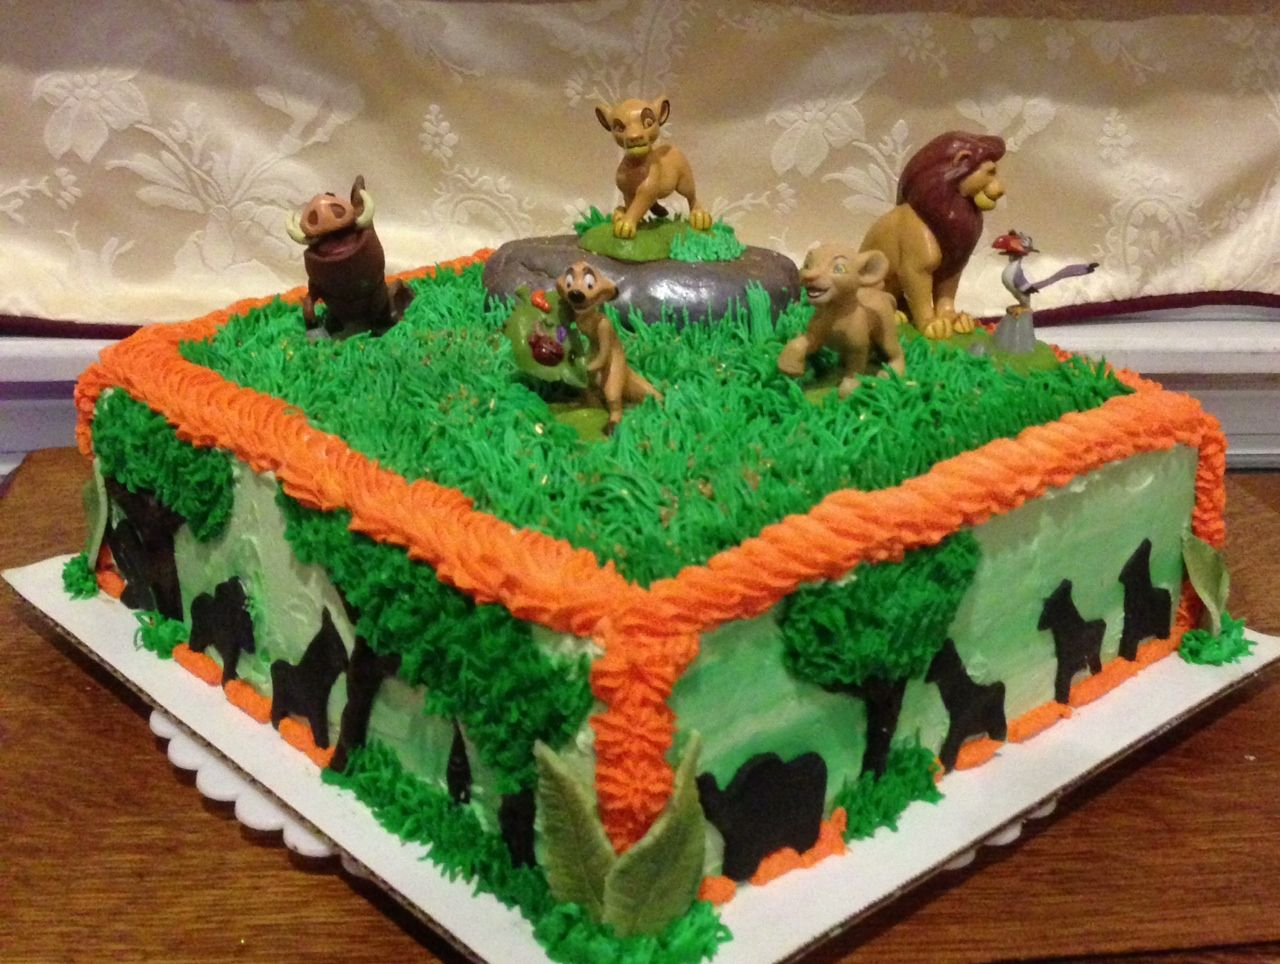 Lion King Cake Decoration Ideas : Lion King cake. Cakes Pinterest